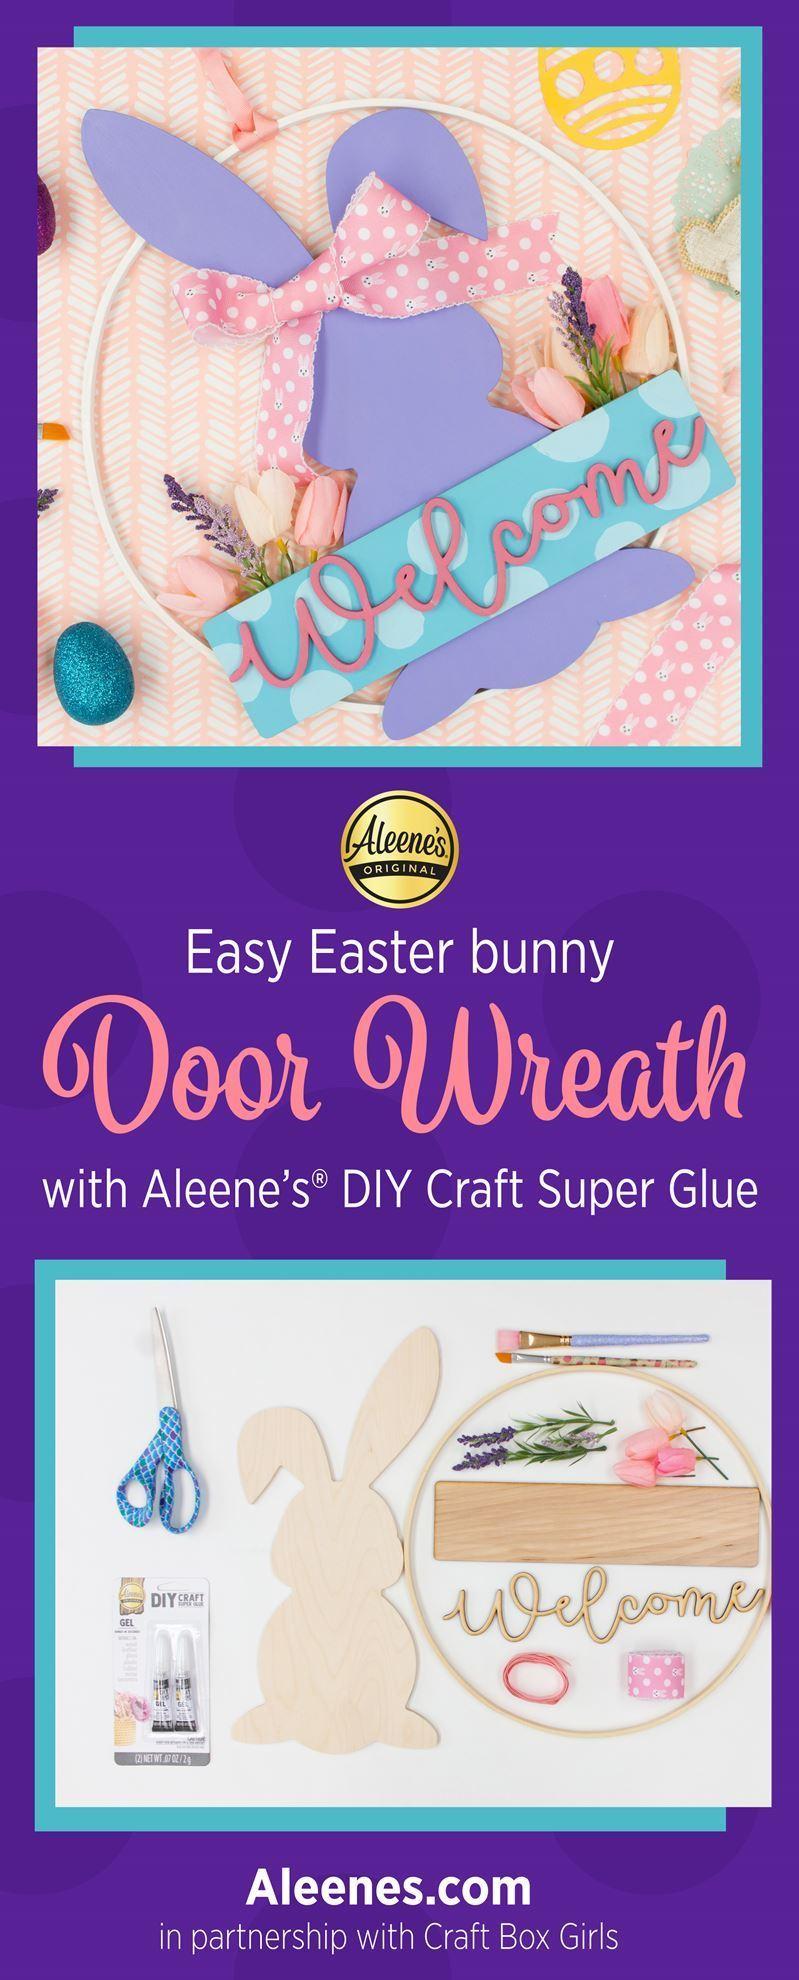 Easter Décor Idea: Bunny Door Wreath